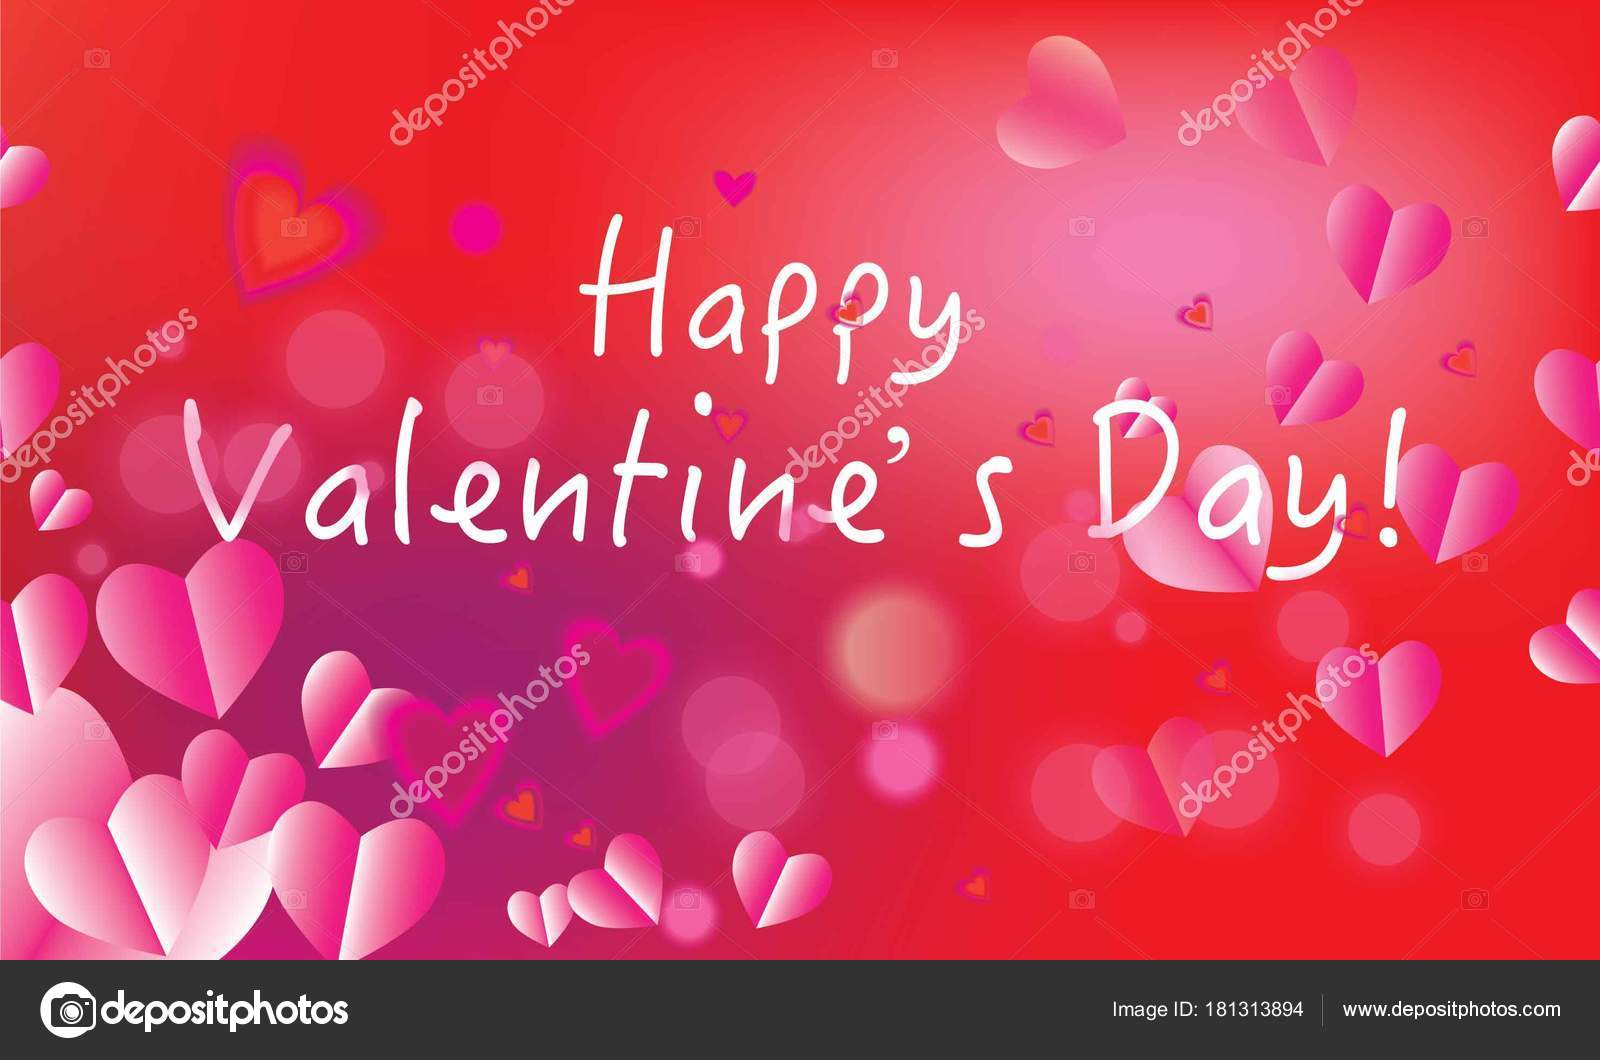 Valentines Day Mother Day Women Day Holiday Birthday Anniversary